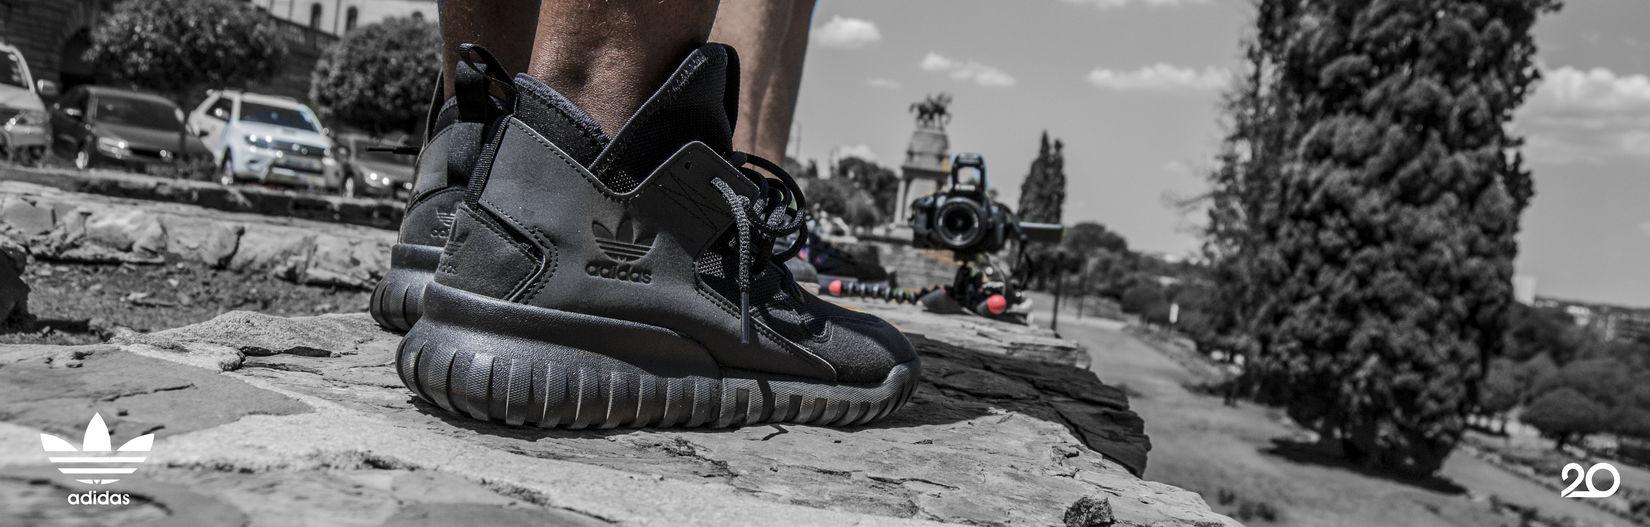 Showcase March Adidas Originals Pretoria Voortrekker Monument Canonphotography Nikonphotography